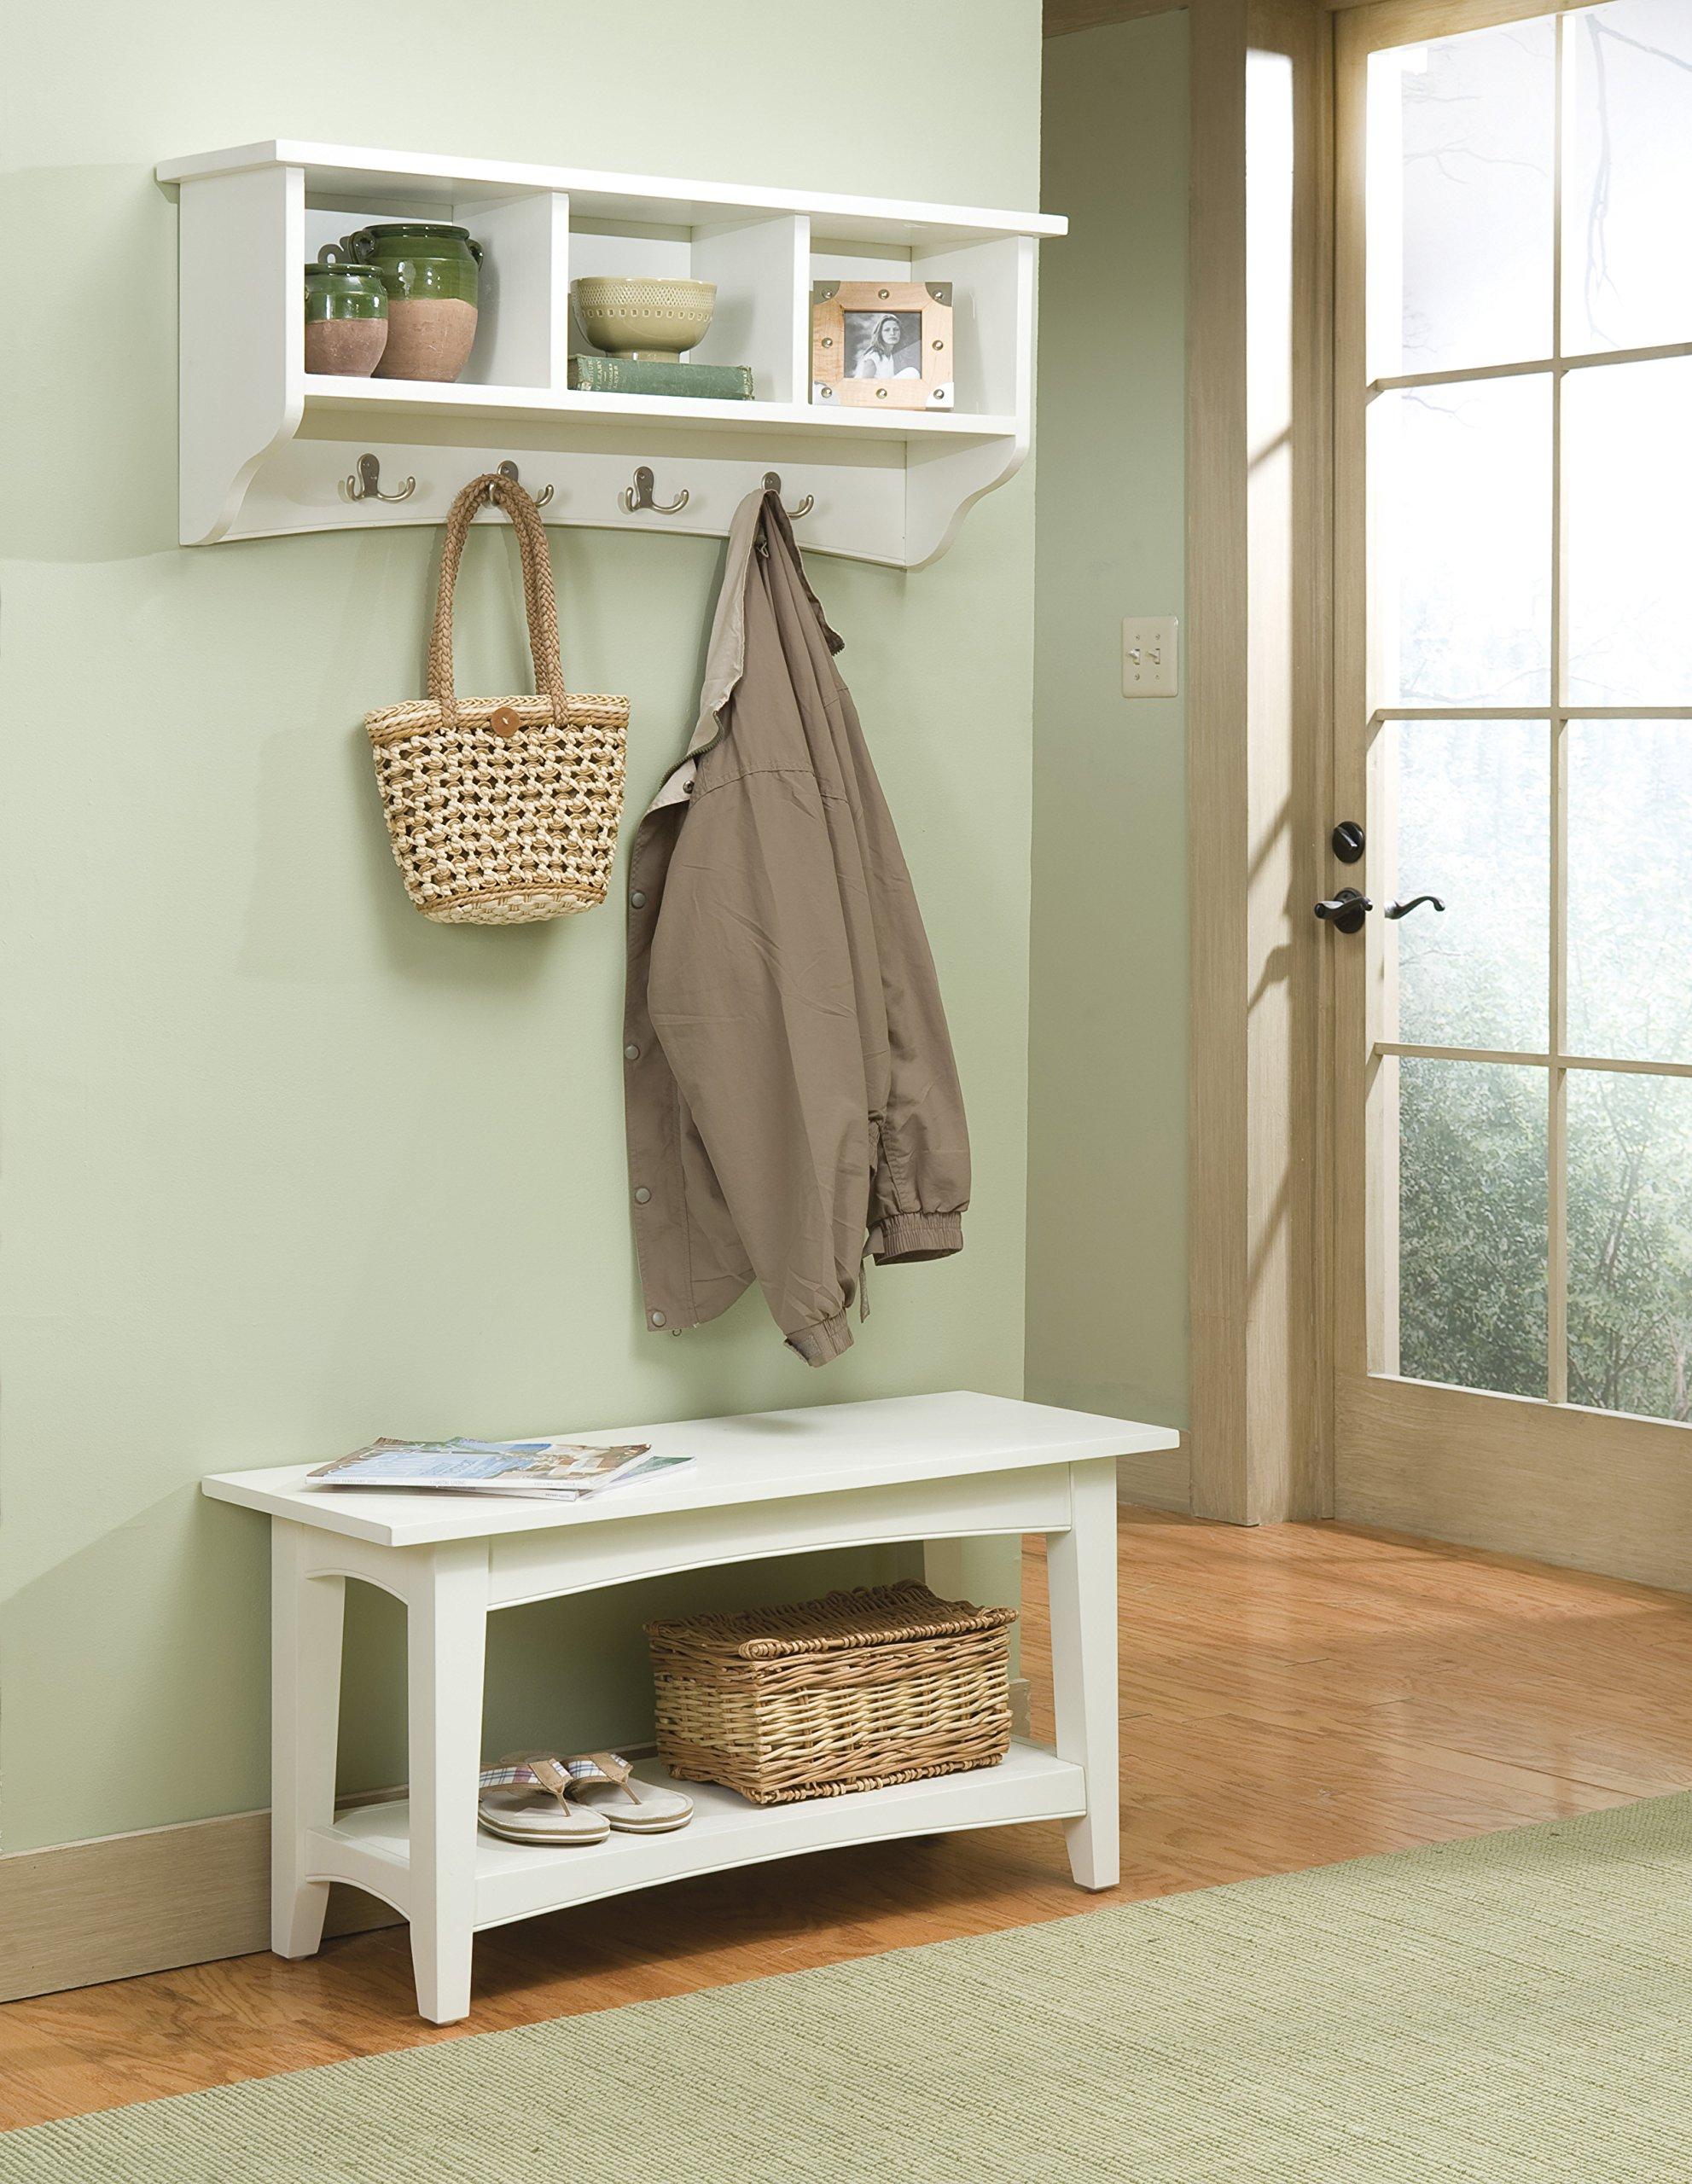 Alaterre Shaker Cottage Storage Coat Hook and Bench Set, Ivory